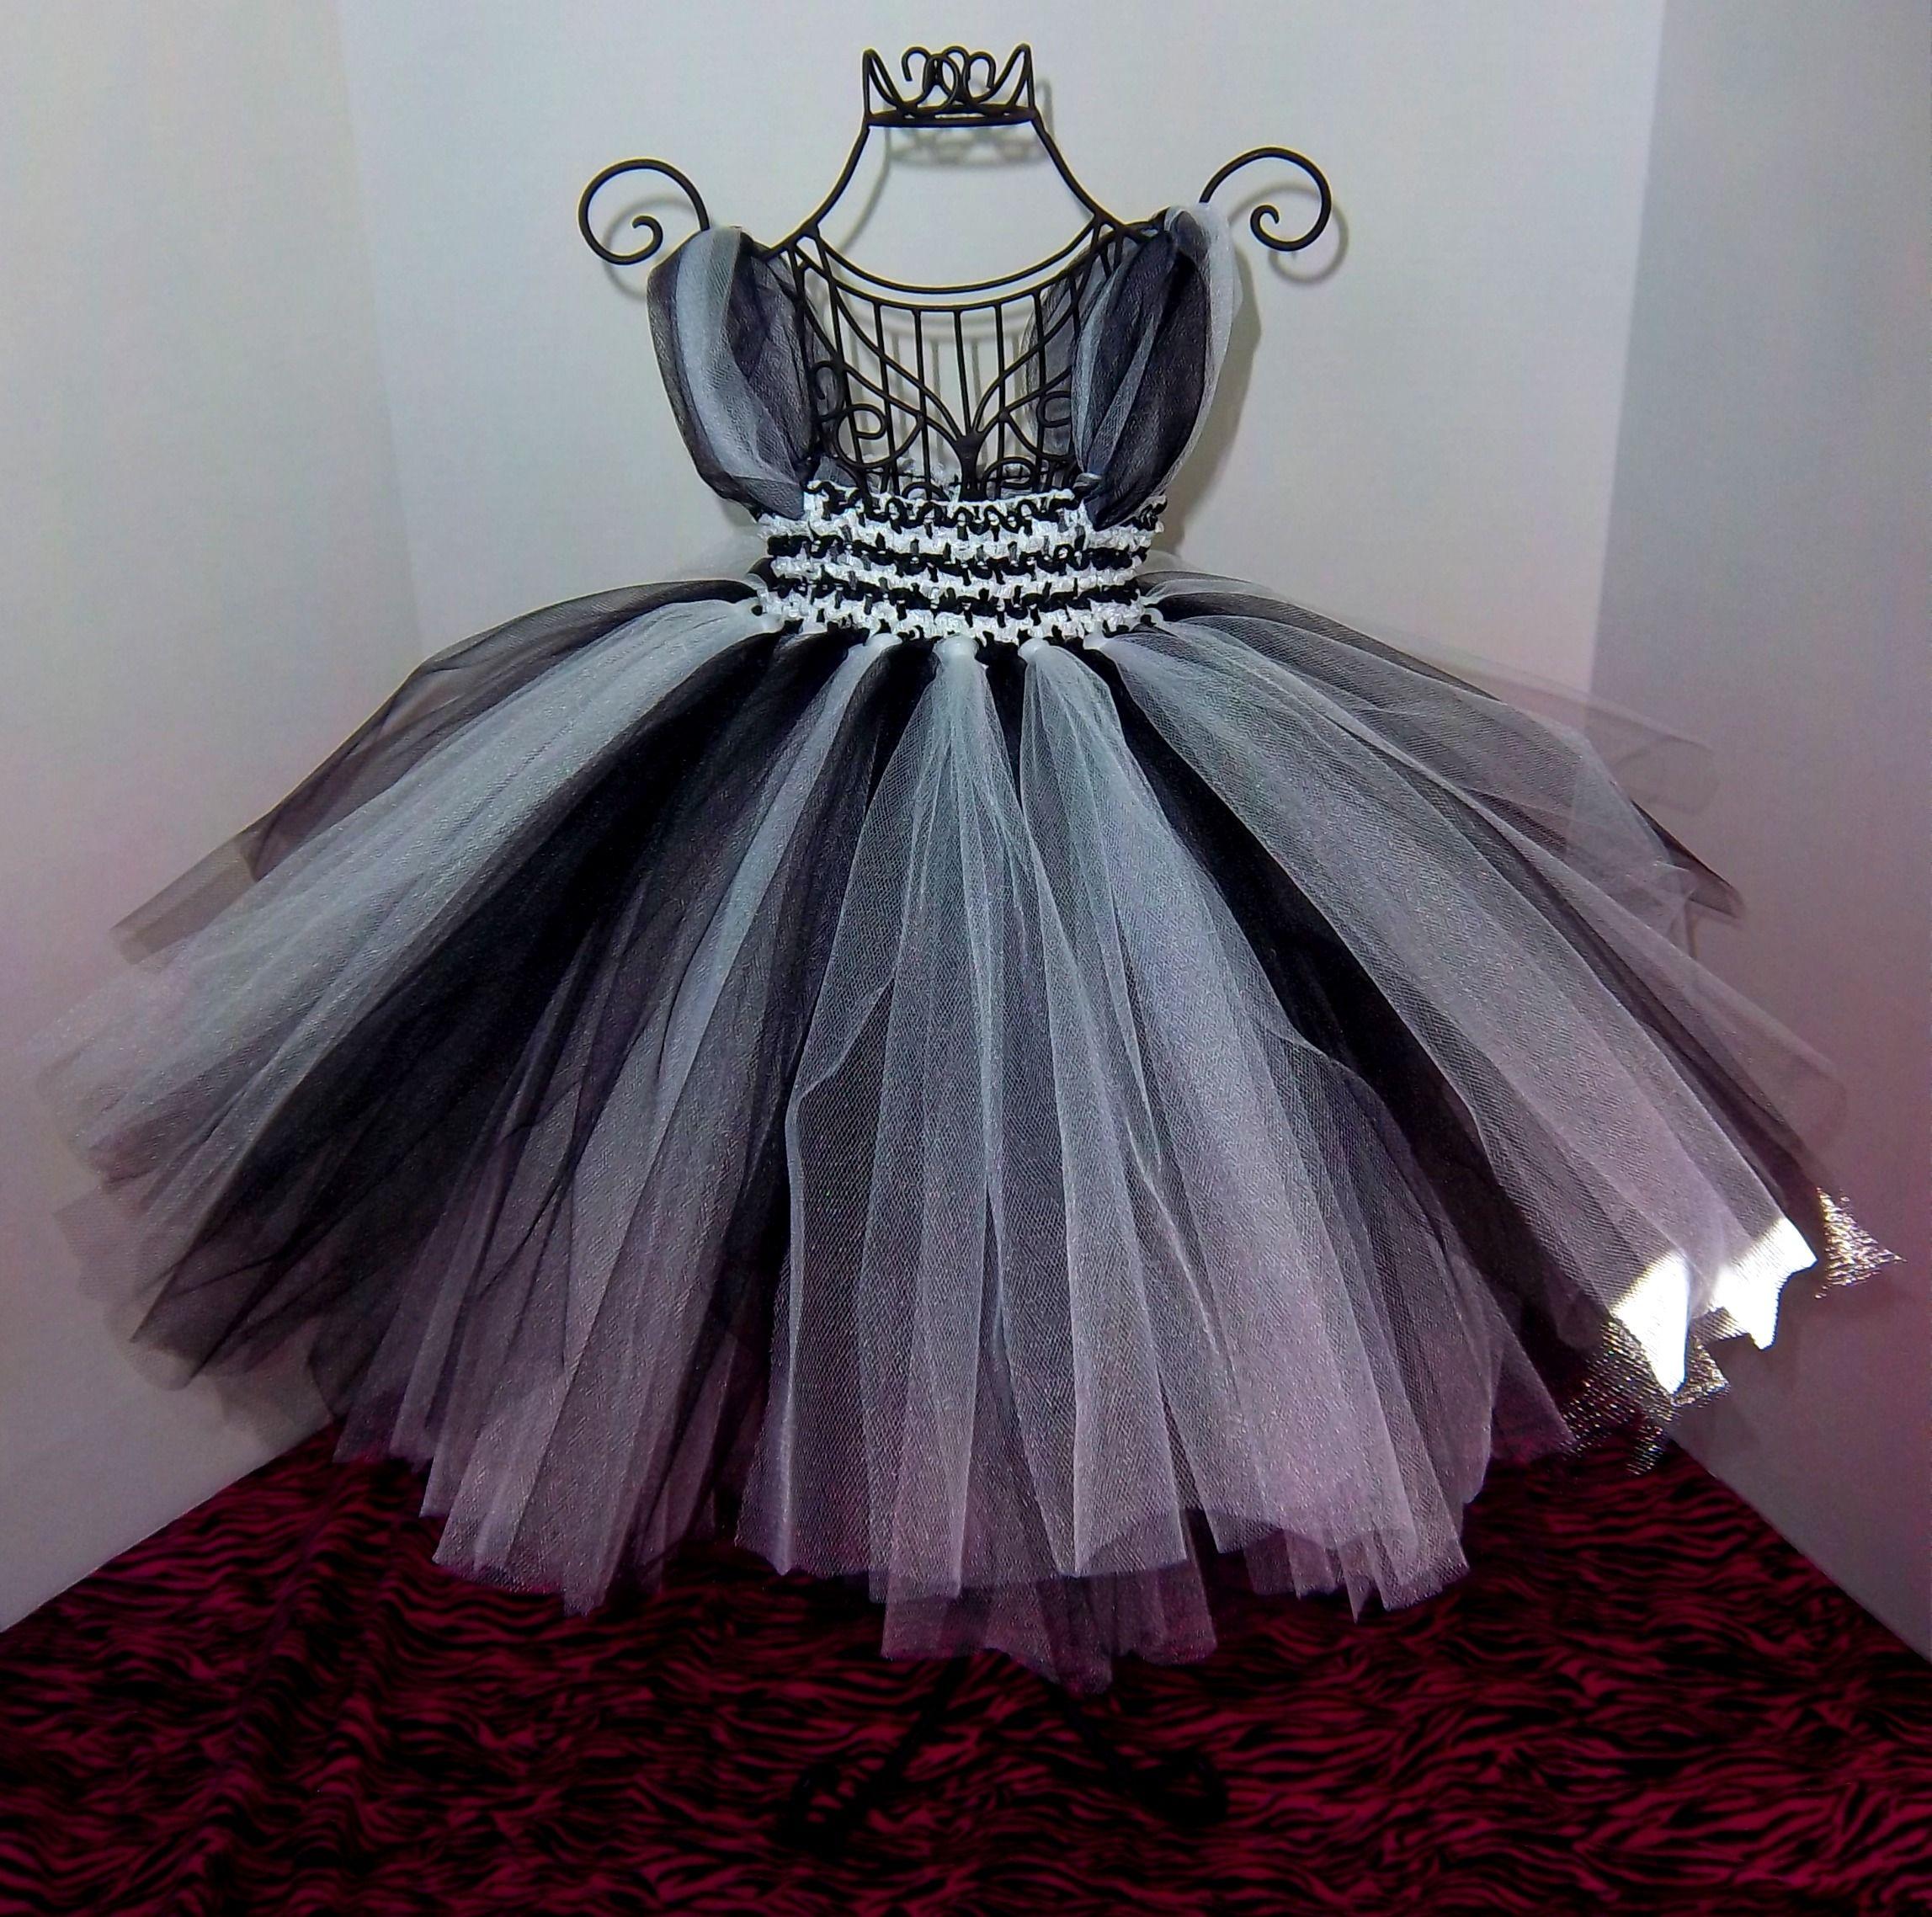 Tutu tulle dress black/white (zebra)